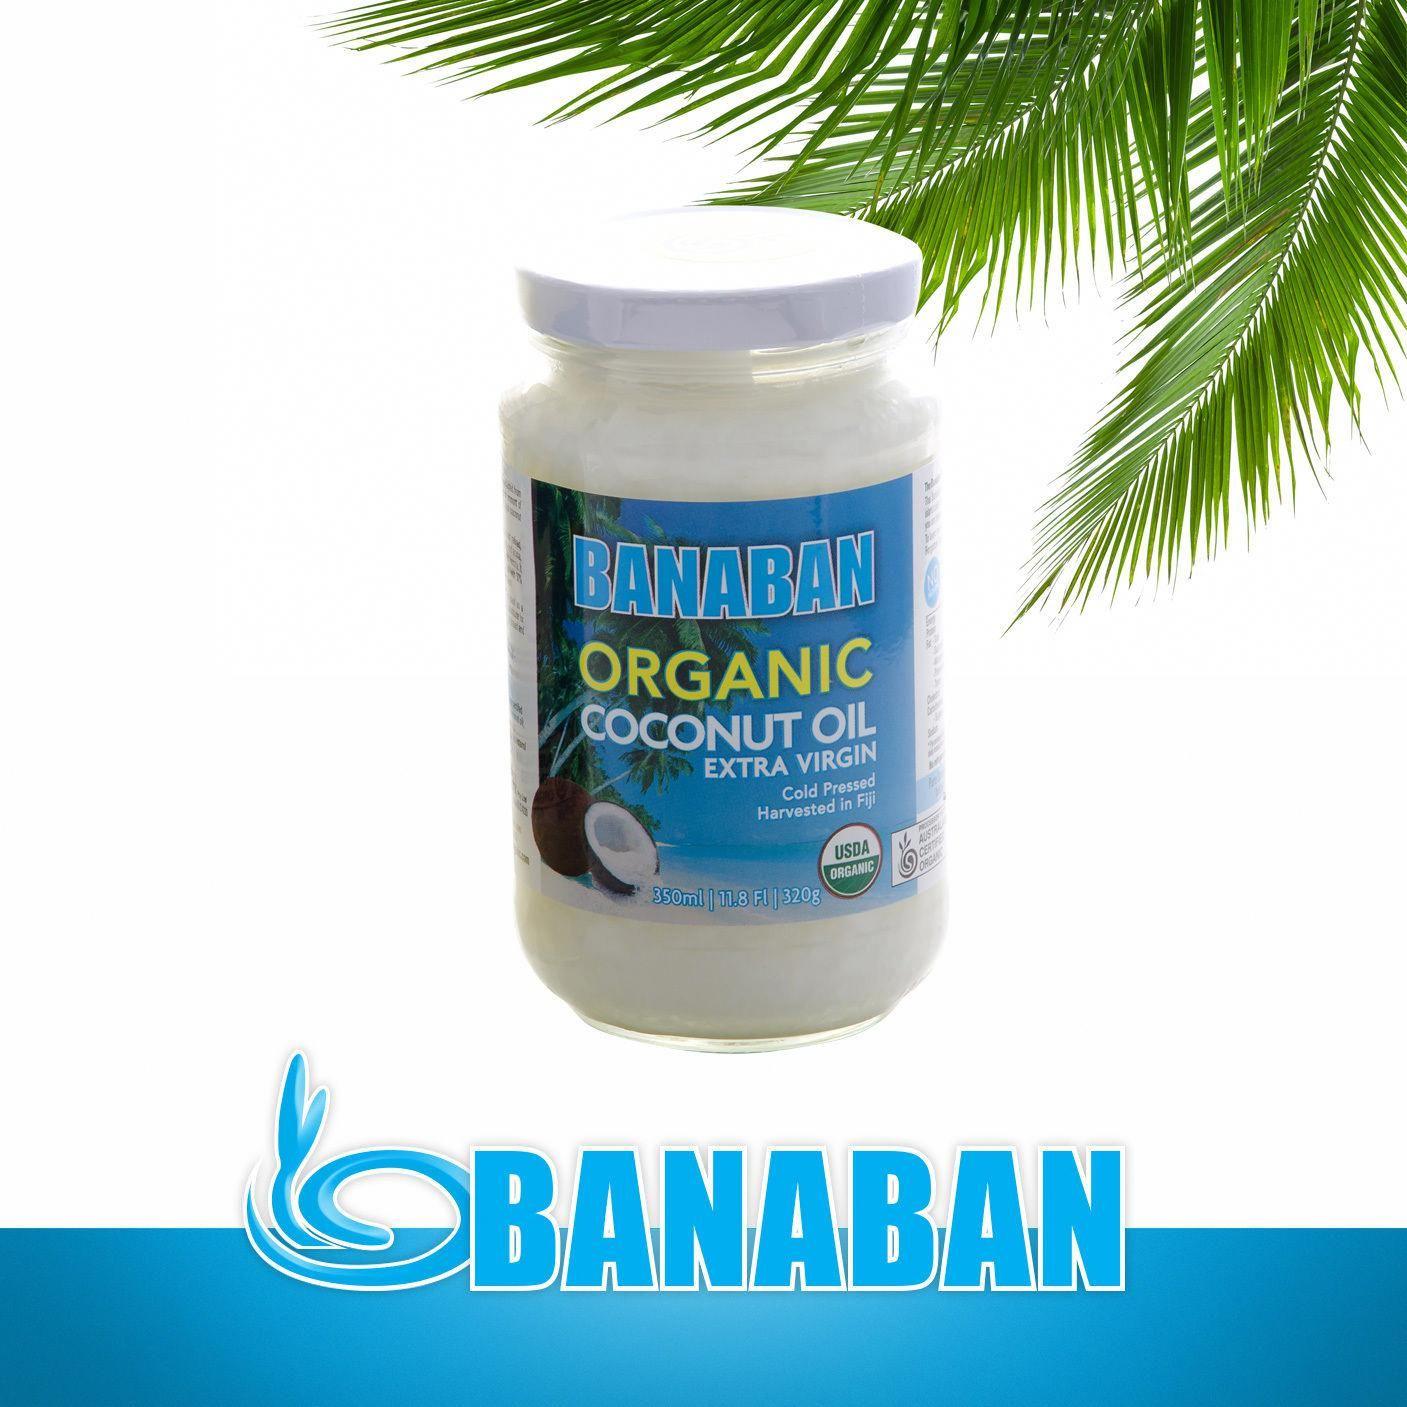 Banaban Certified Organic Extra Virgin